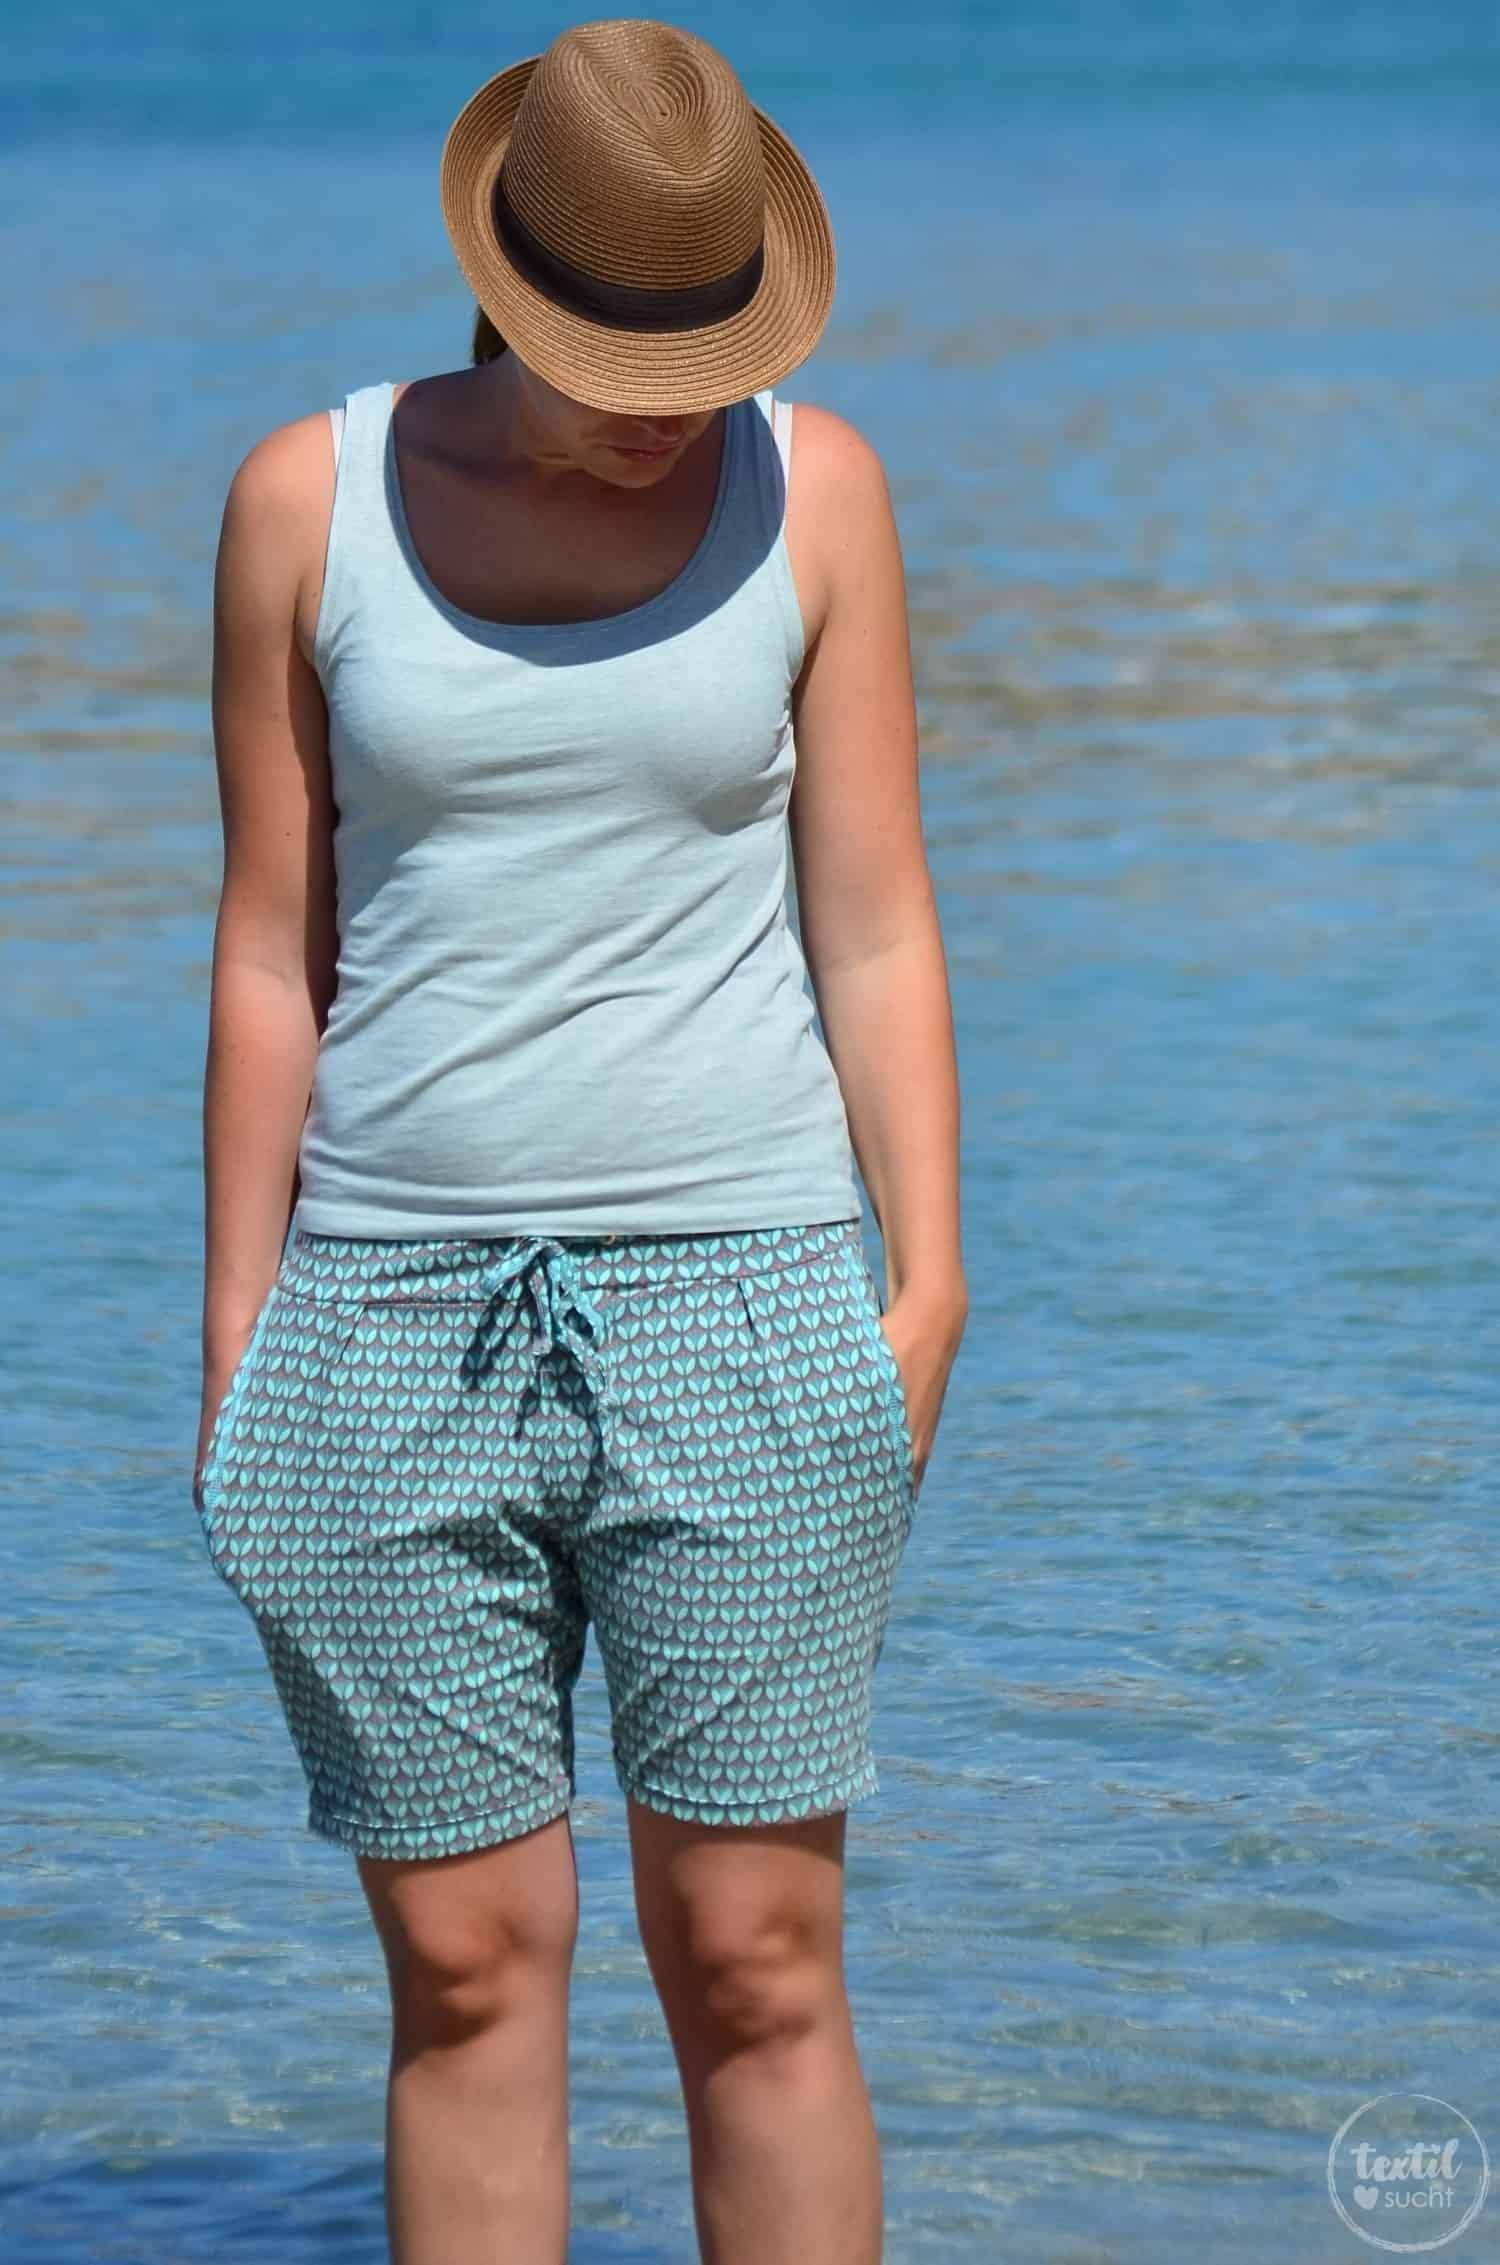 Nähen für den Strand: Schnittmuster Velara als Shorts - Bild 9 | textilsucht.de